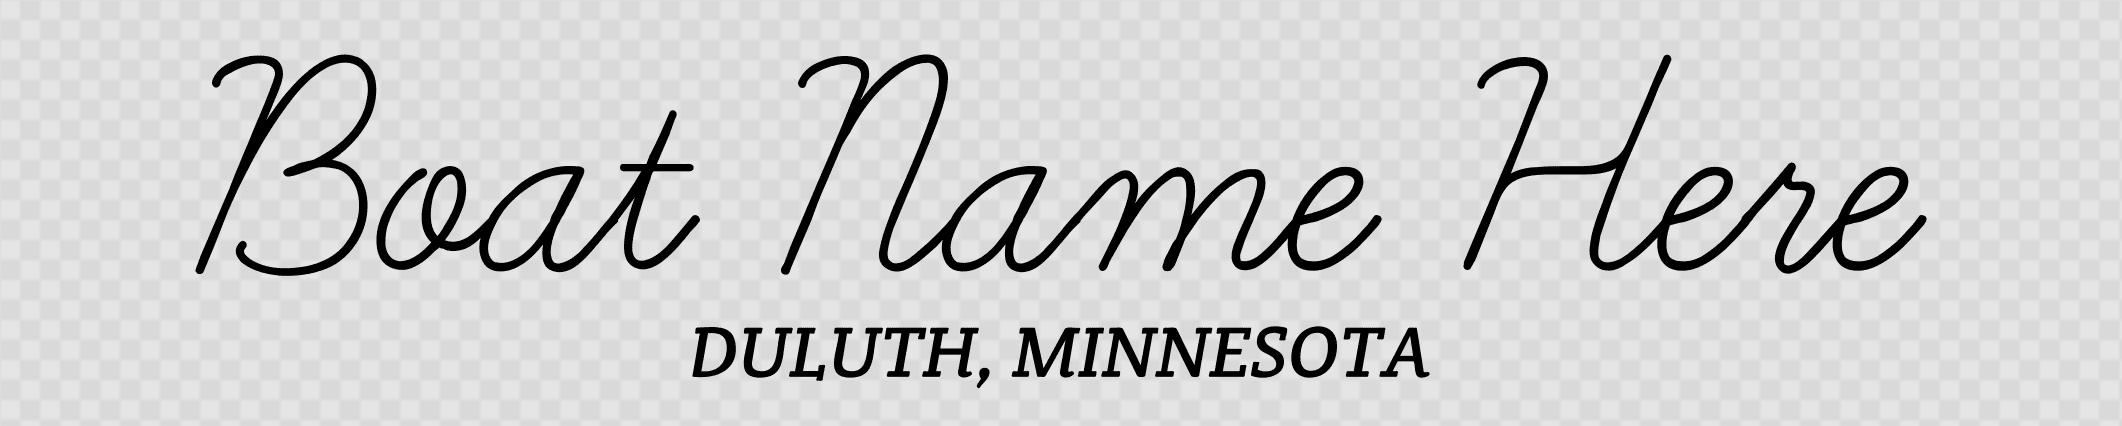 Minnesota hailing port template